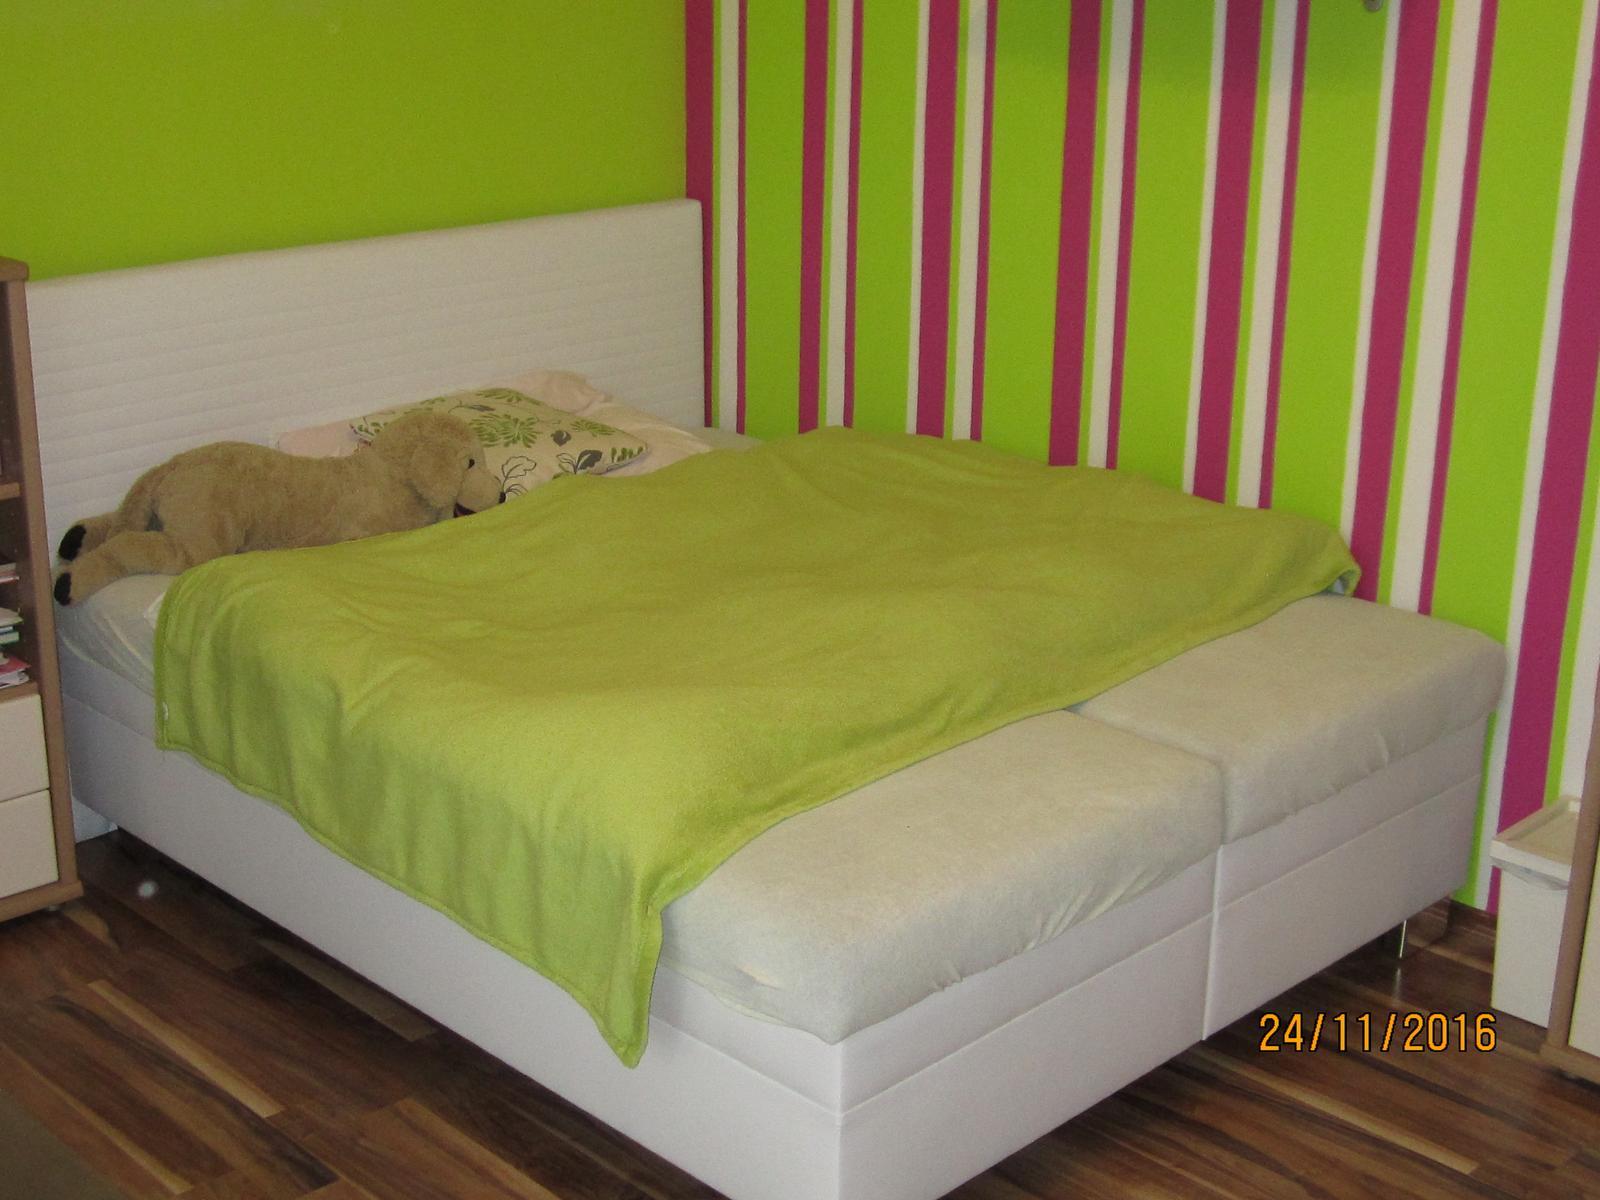 Detska - studentska izba - a nase baby  maju  nove leháro :)   polohovatelne rošty  ako bonus k pozeraniu telky :) do buducna  vyuziju skor tuto postel uz ...